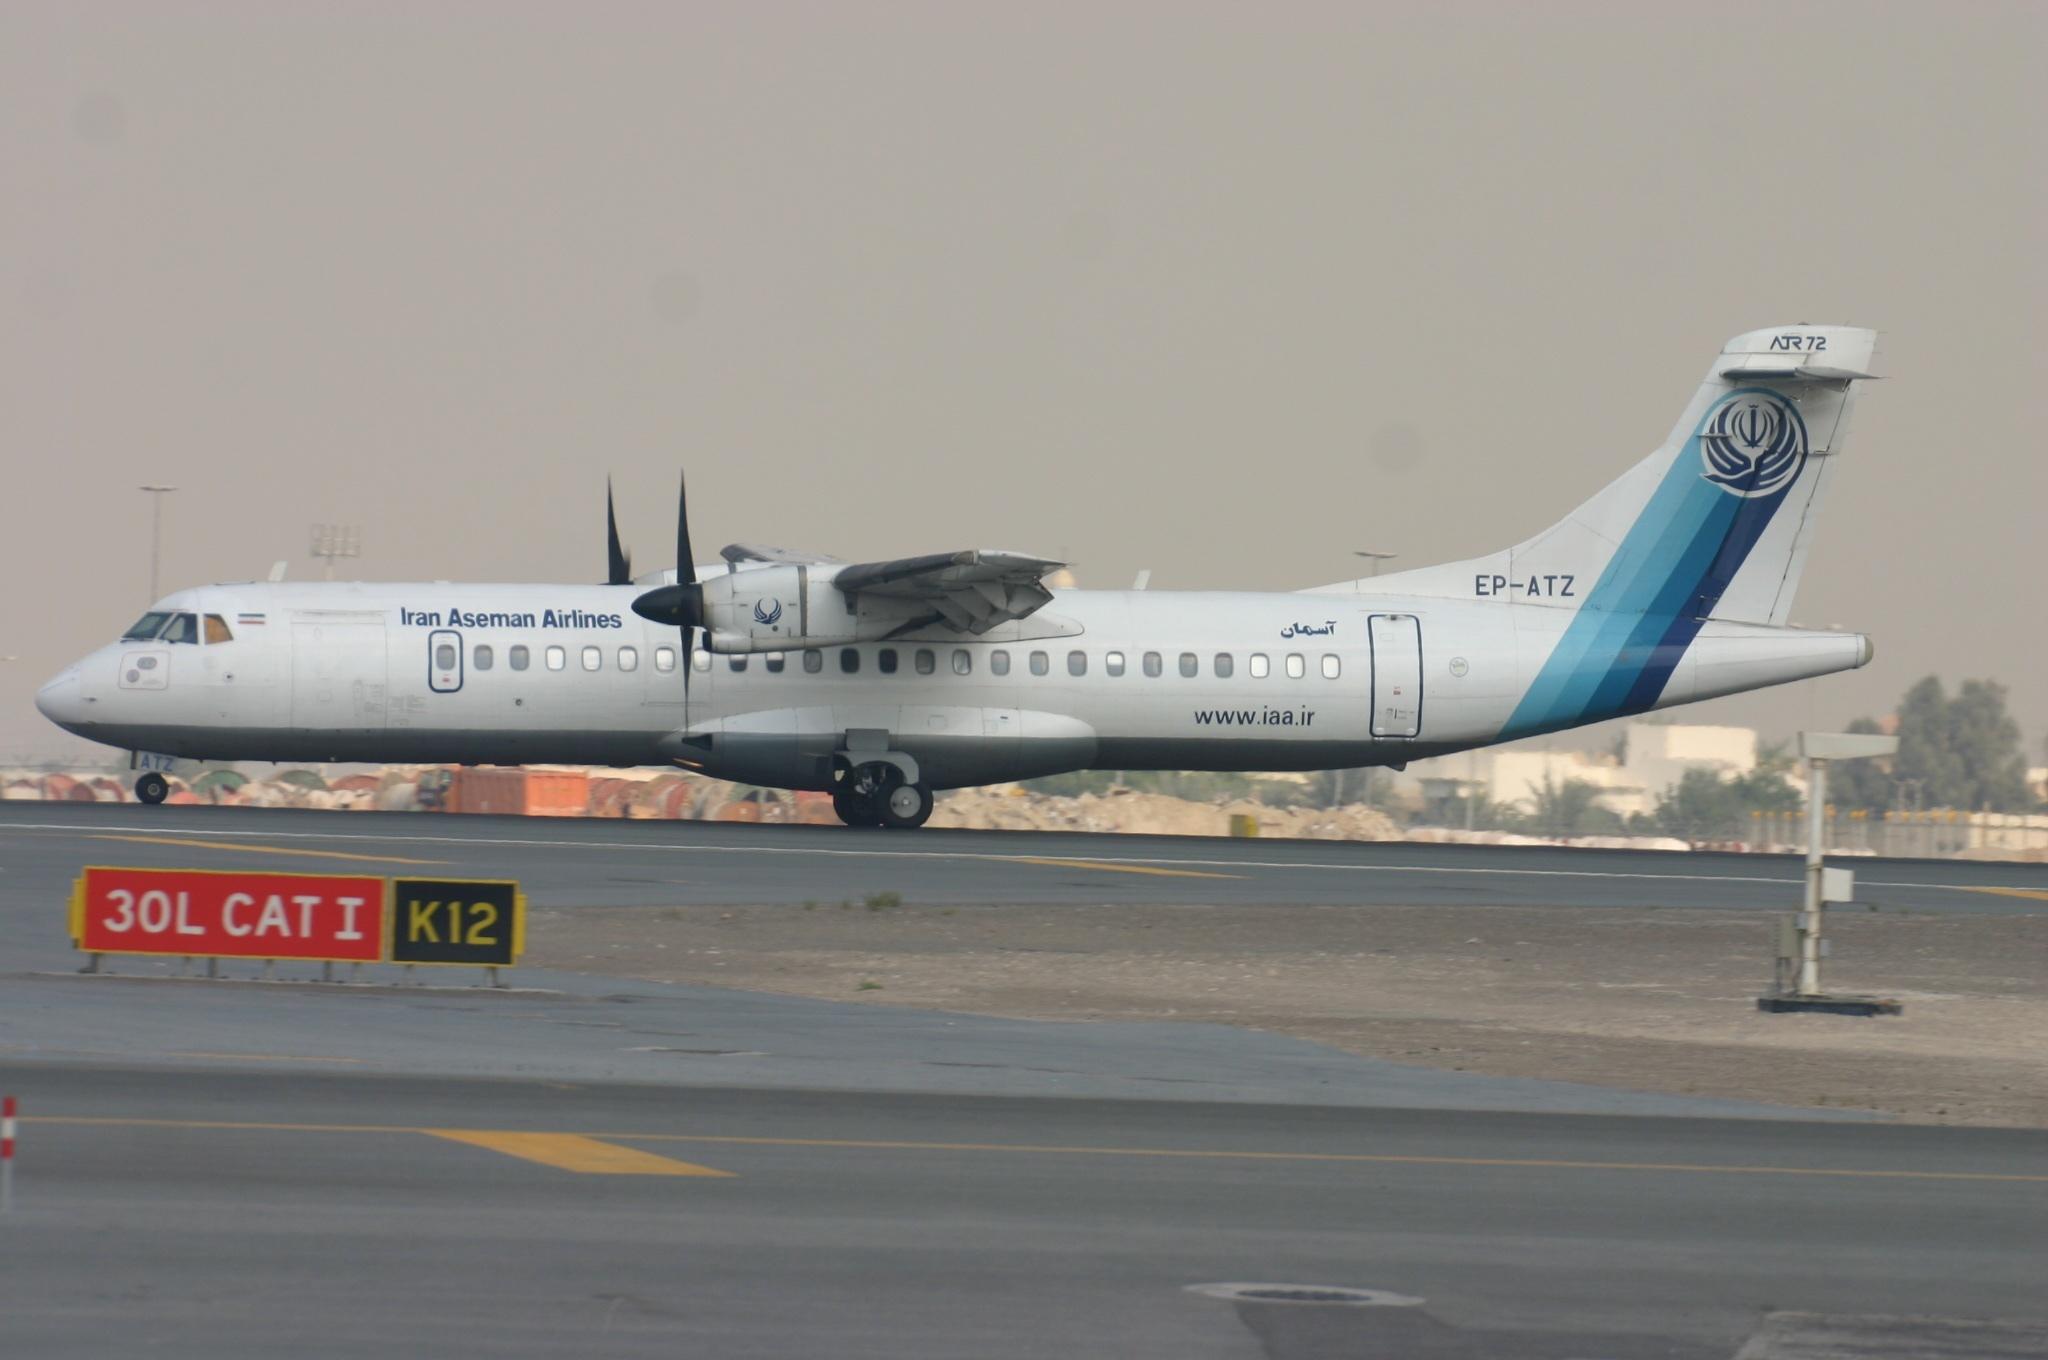 En ATR 72-500 fra det iranske flyselskab Iran Aseman Airlines. Foto: Aeroprints.com